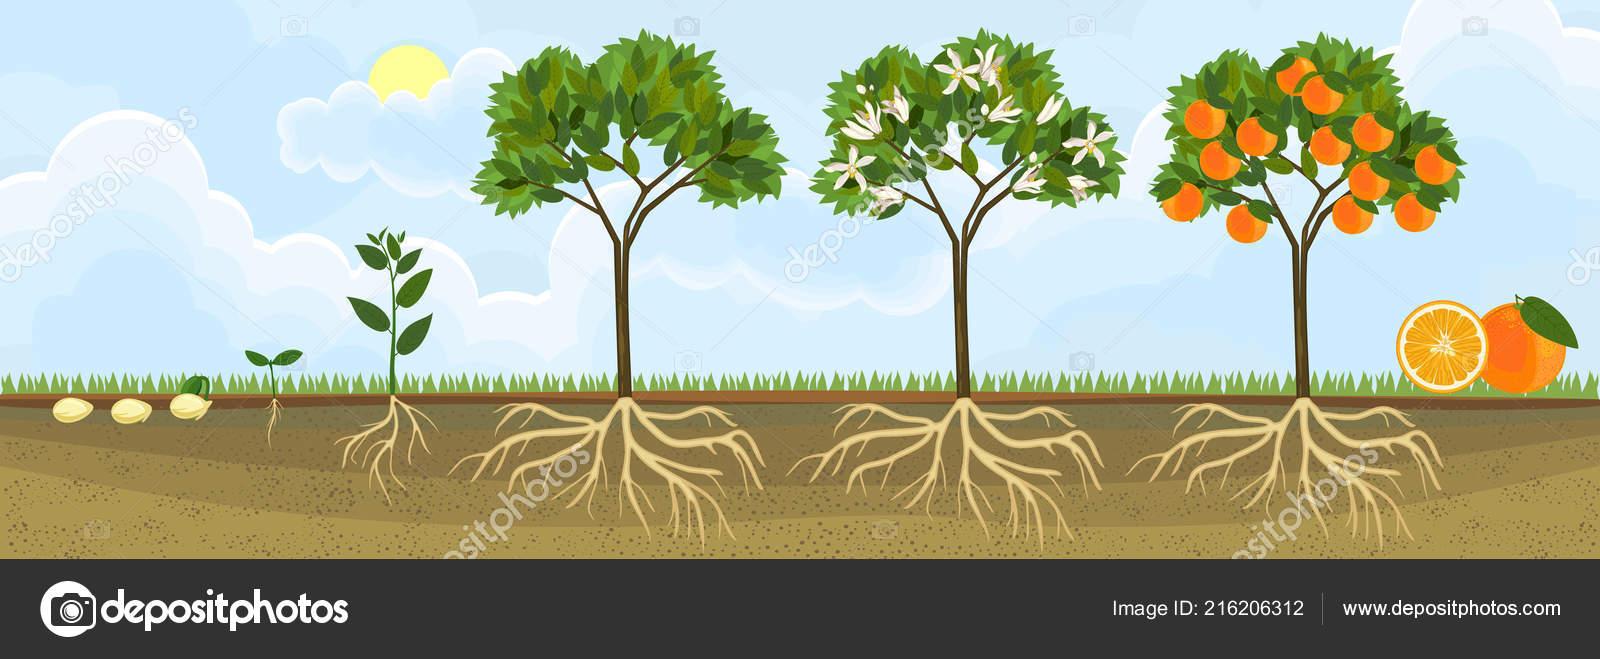 1,162 Root tree fruit Vectors, Royalty-free Vector Root tree fruit Images |  Depositphotos®Depositphotos